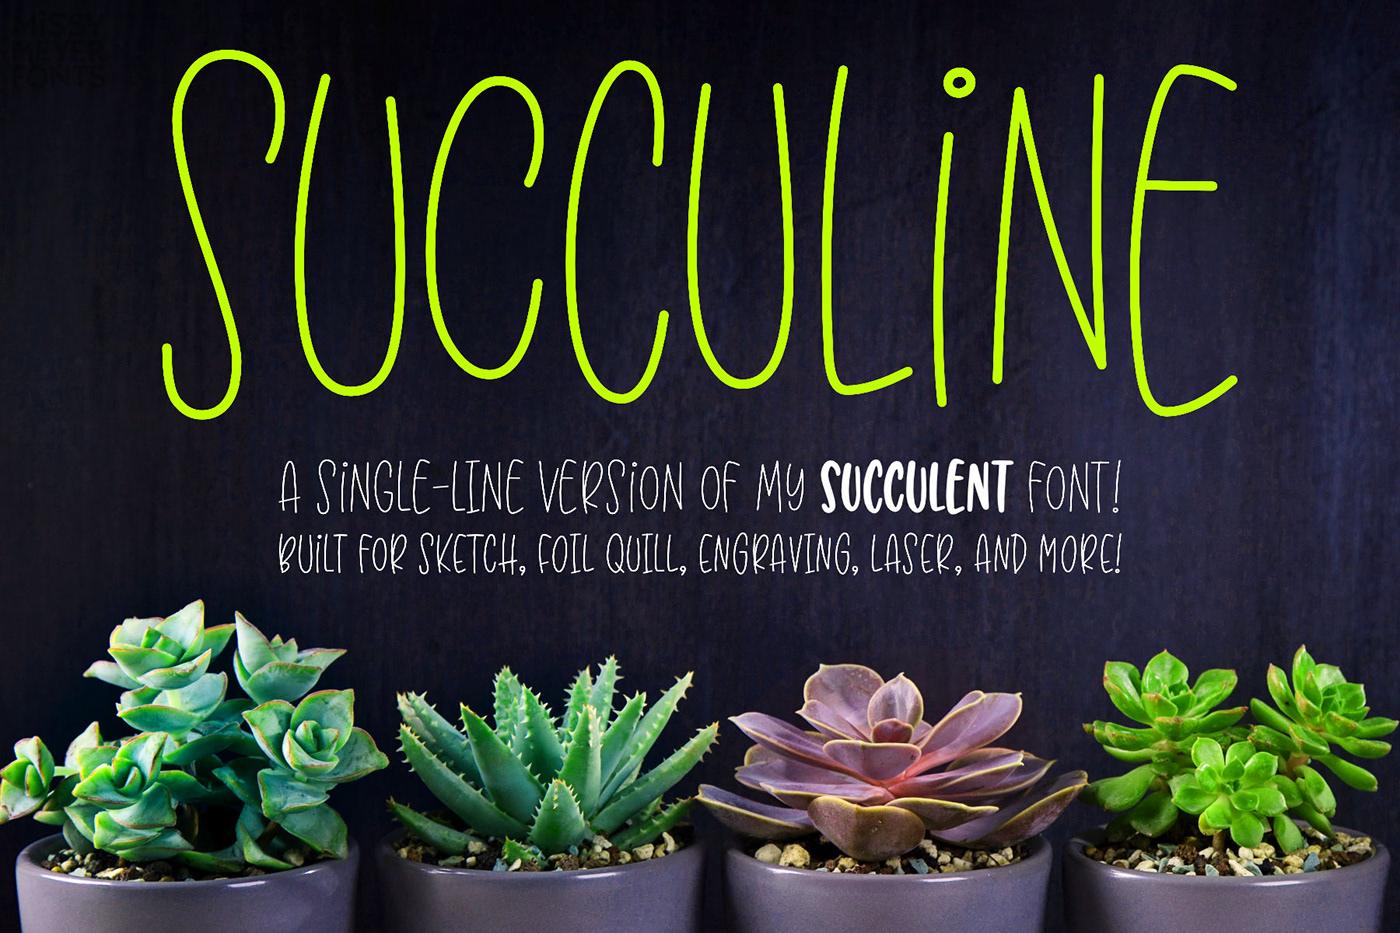 engraving font hairline laser single-line sketch Succulent succuline Typeface